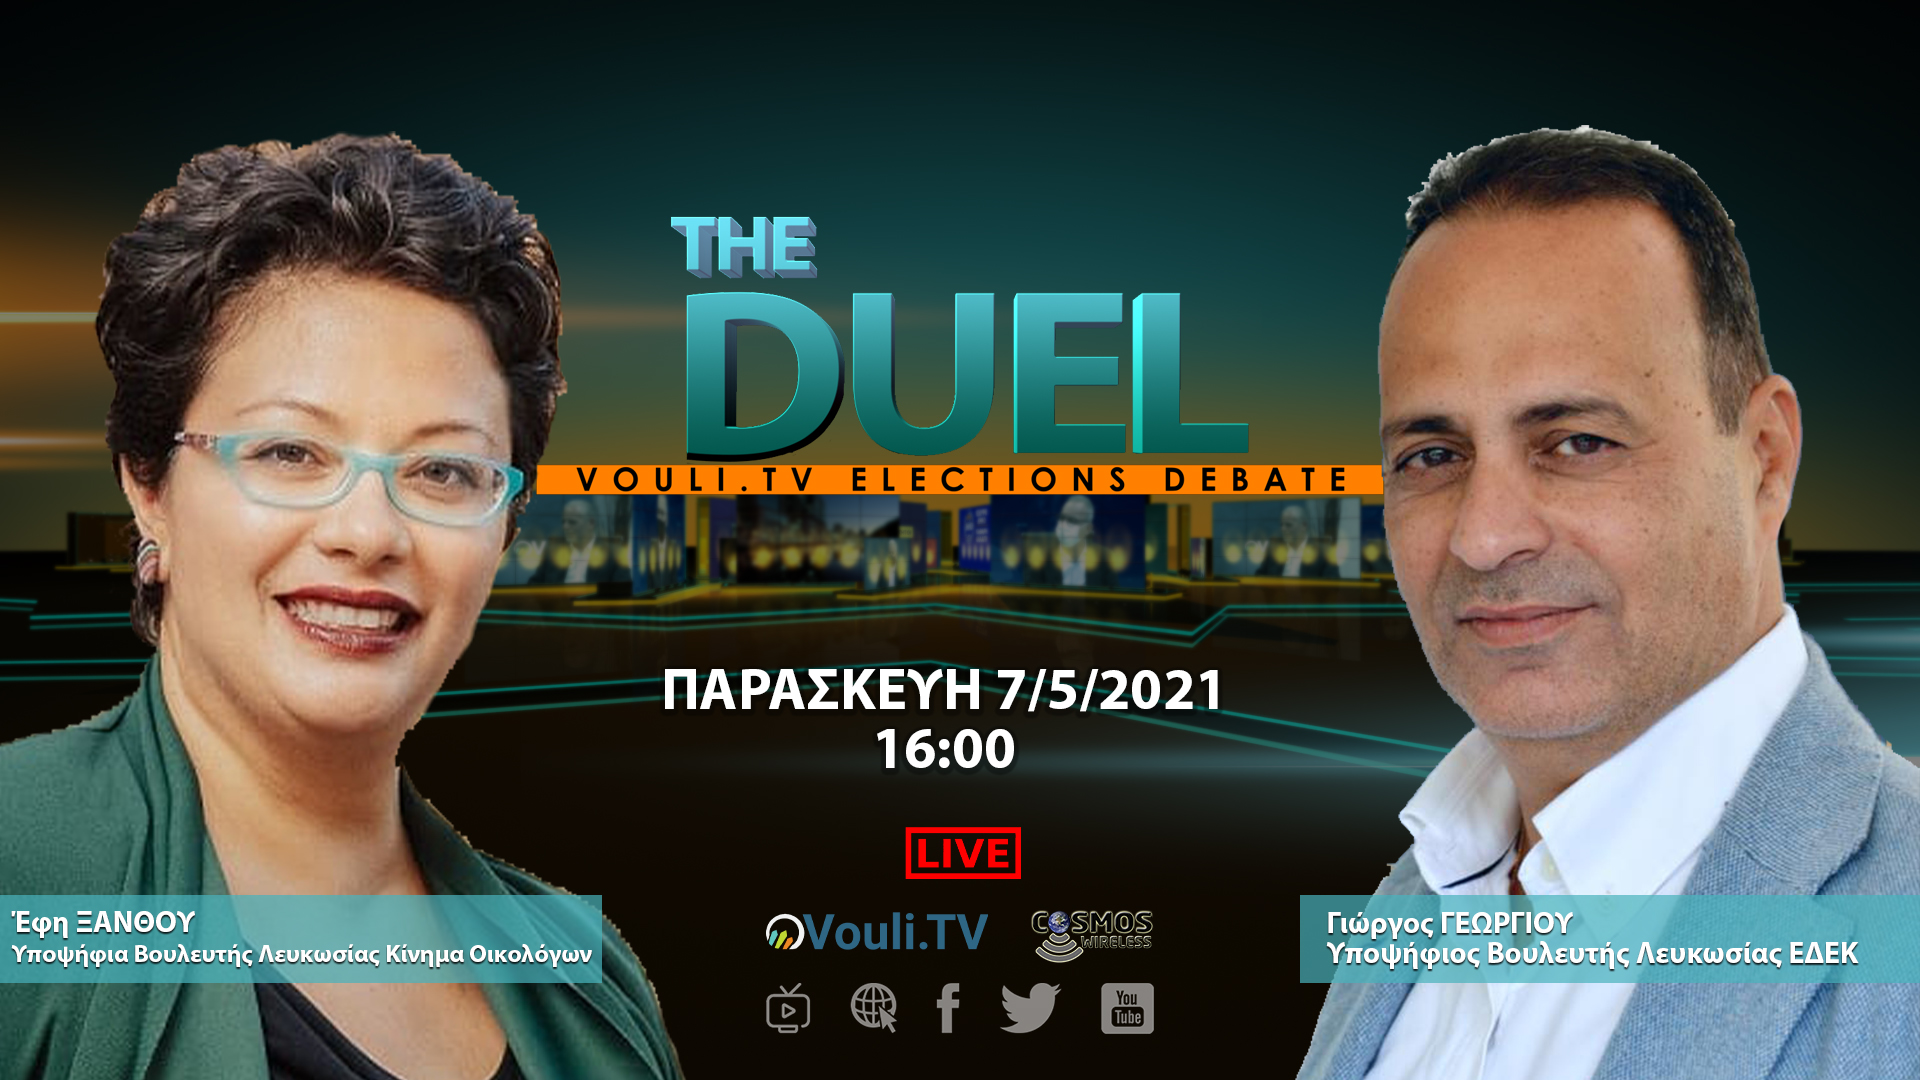 'The Duel' «Η επόμενη μέρα της πενταμερούς διάσκεψης», με Γεωργίου (ΕΔΕΚ) και Ξάνθου (Οικολόγοι)  | 07/05/2021